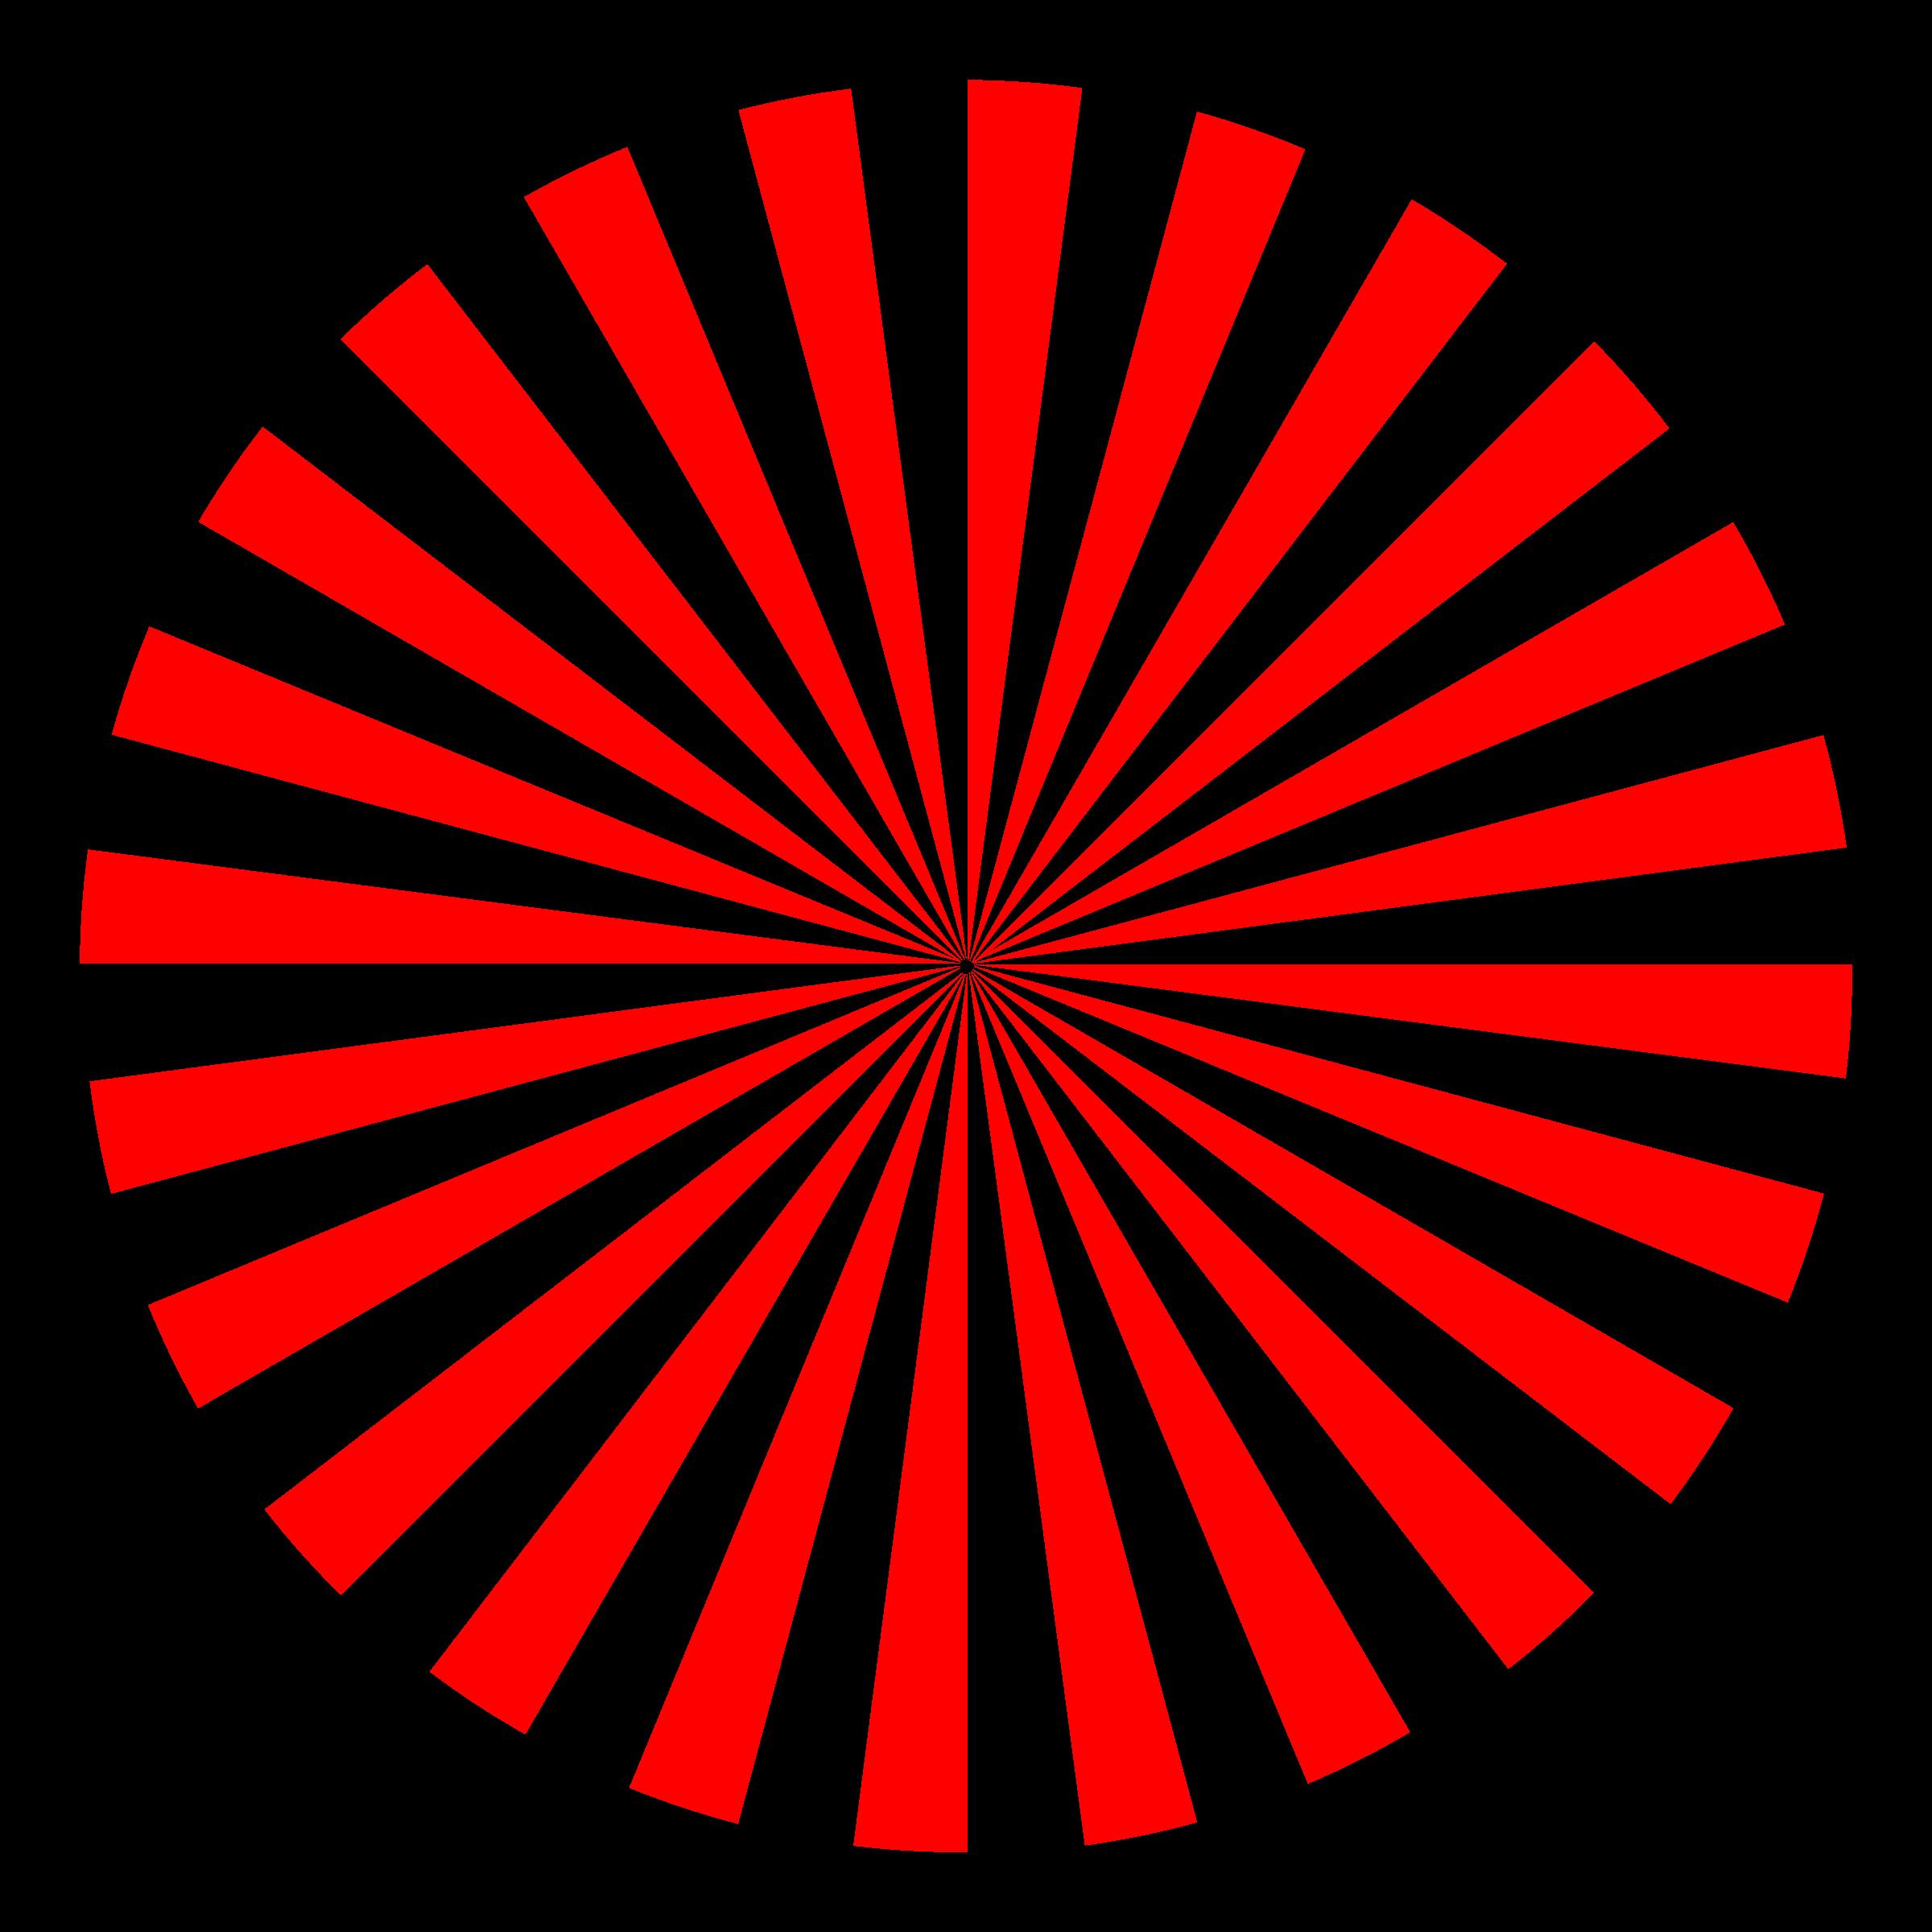 Sun vector clipart vector free Clipart - abstract sun 3 (48 rays) vector free